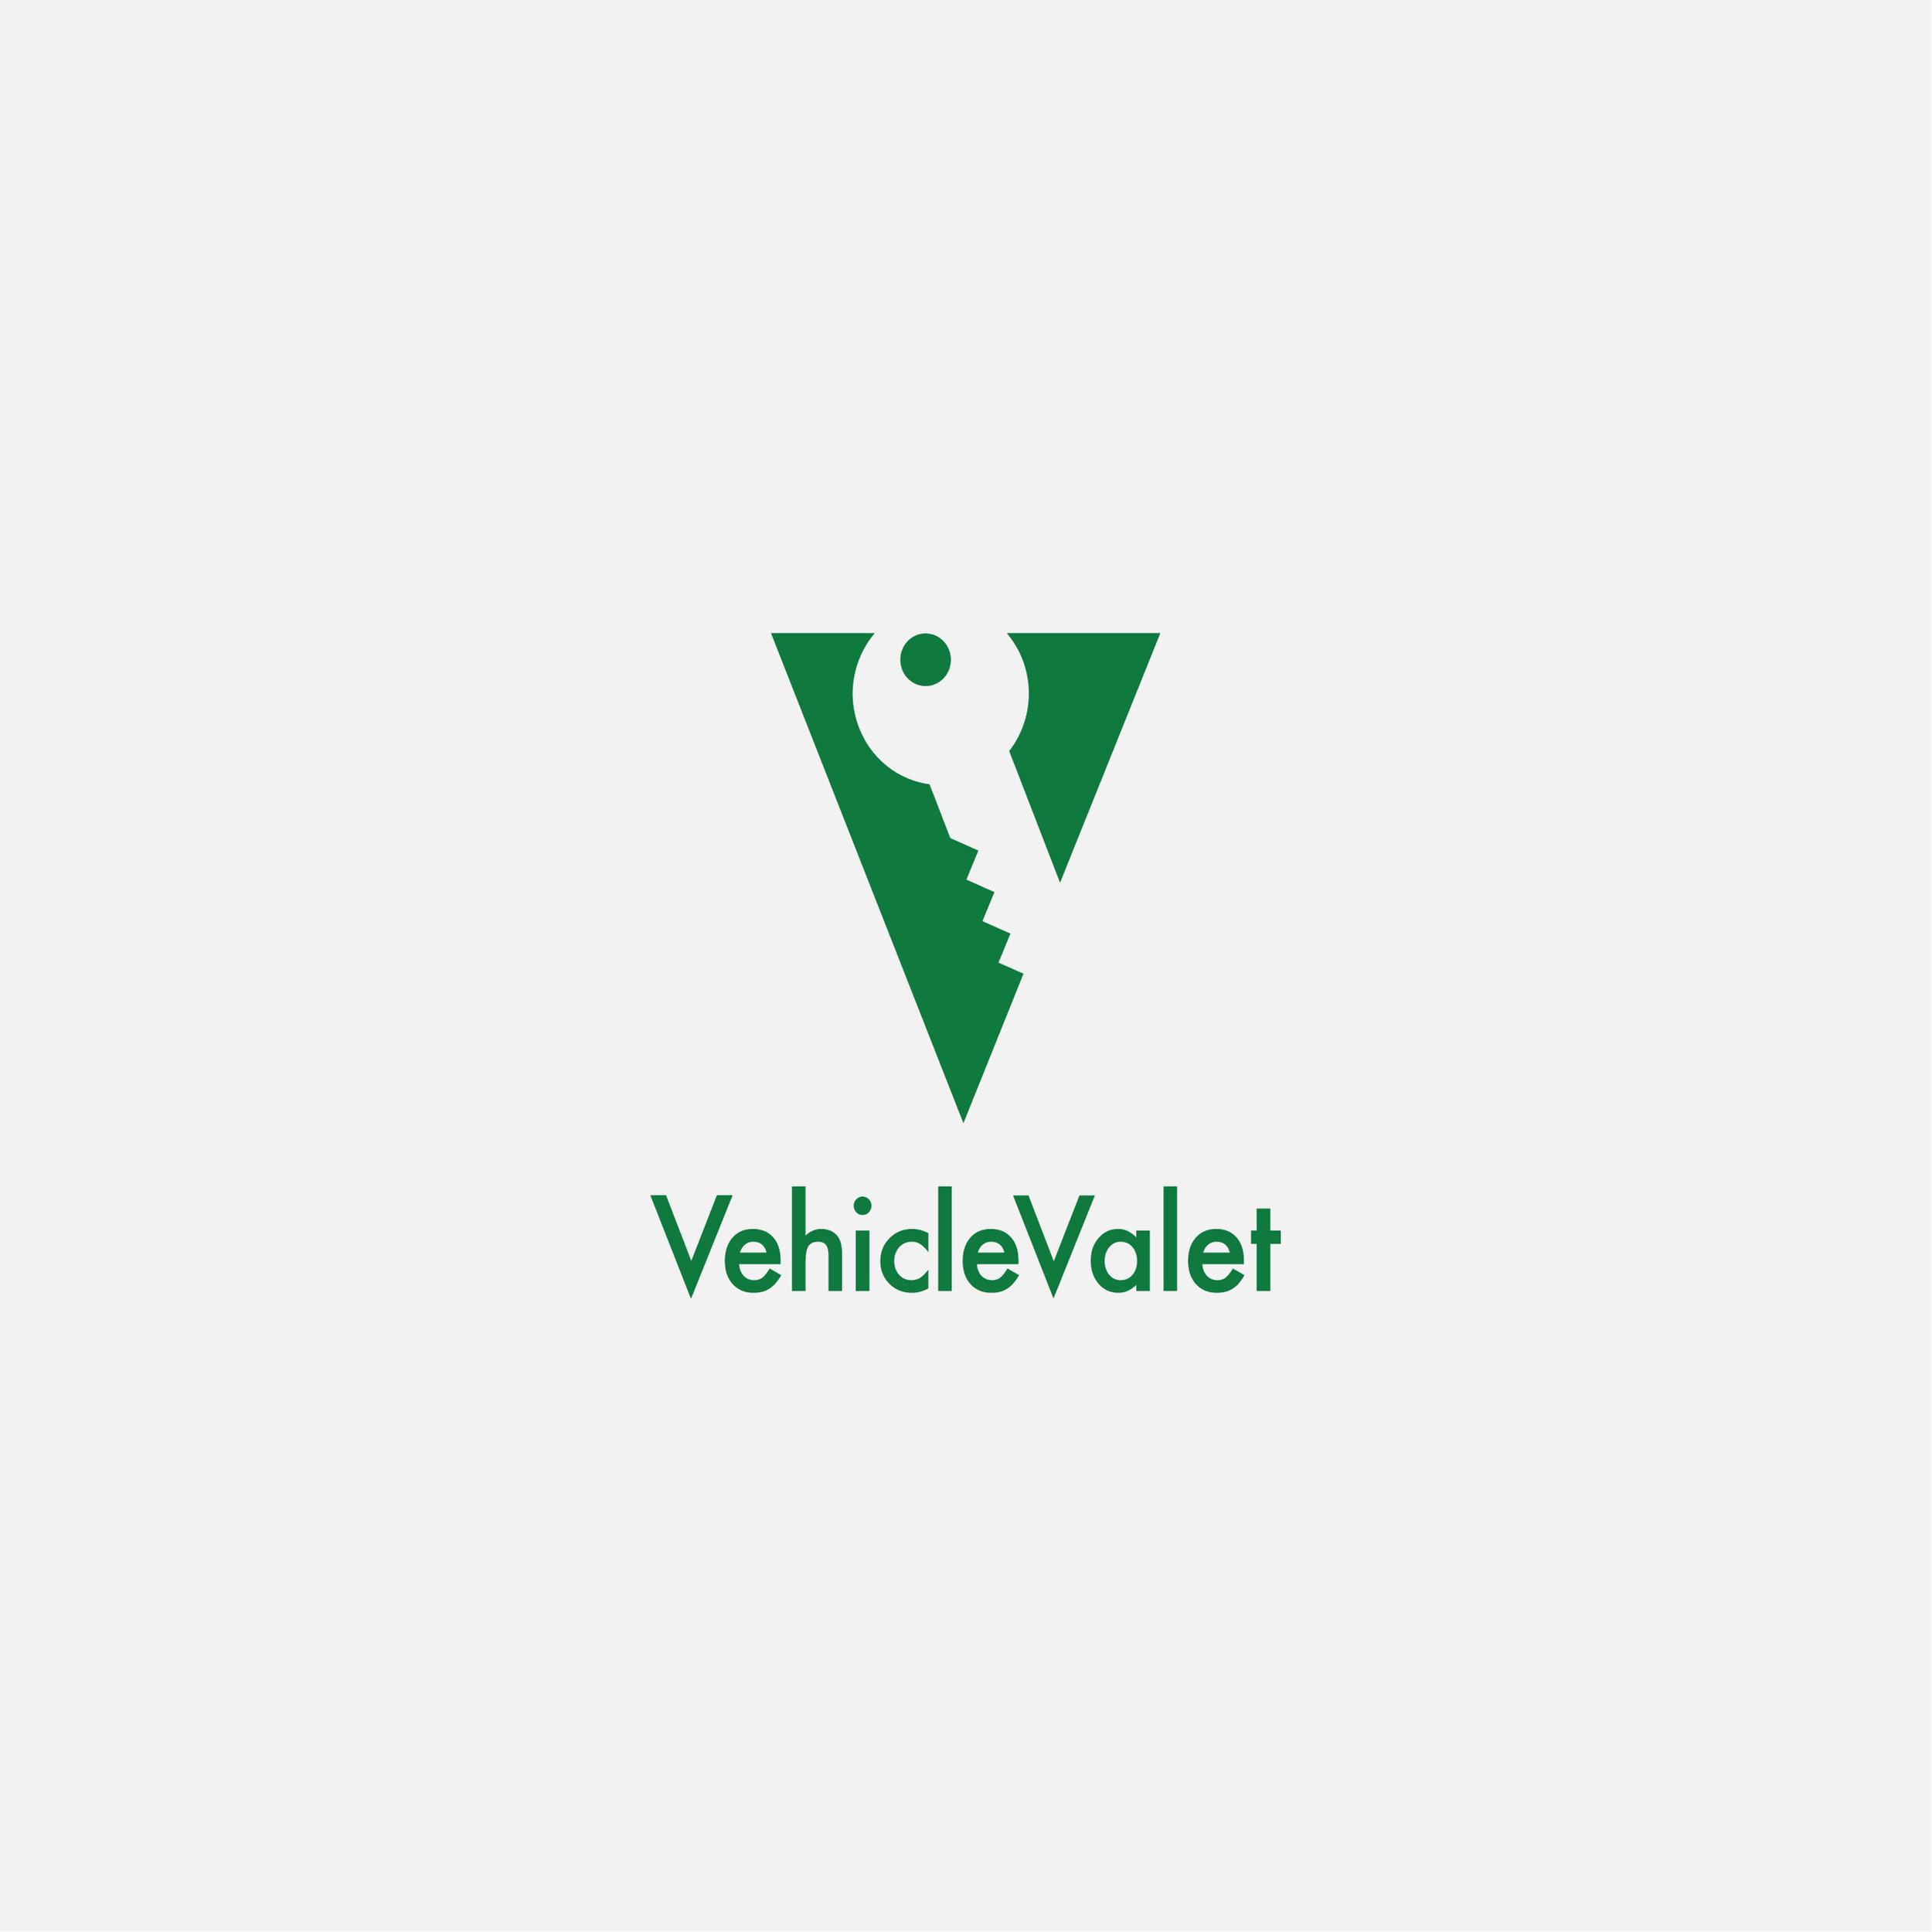 Vehicle Valet.jpg